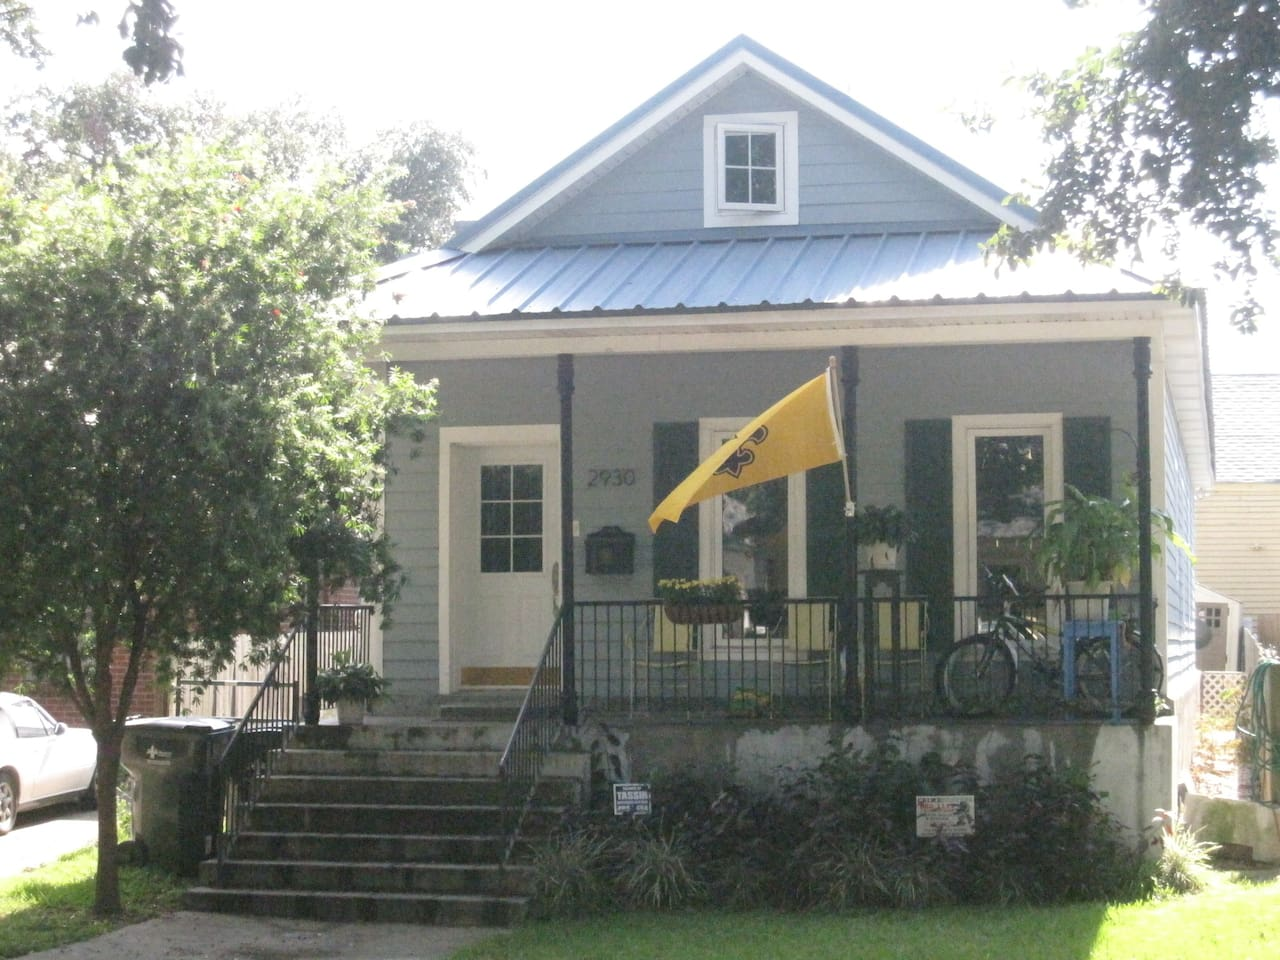 2930 Banks Street 1500 sf shotgun style new house